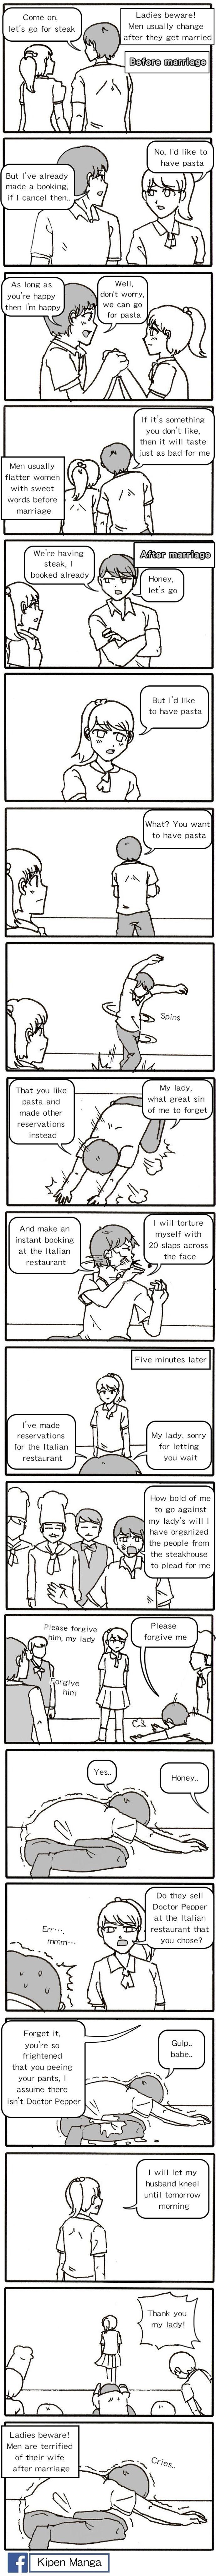 Kipen Manga - Marriage